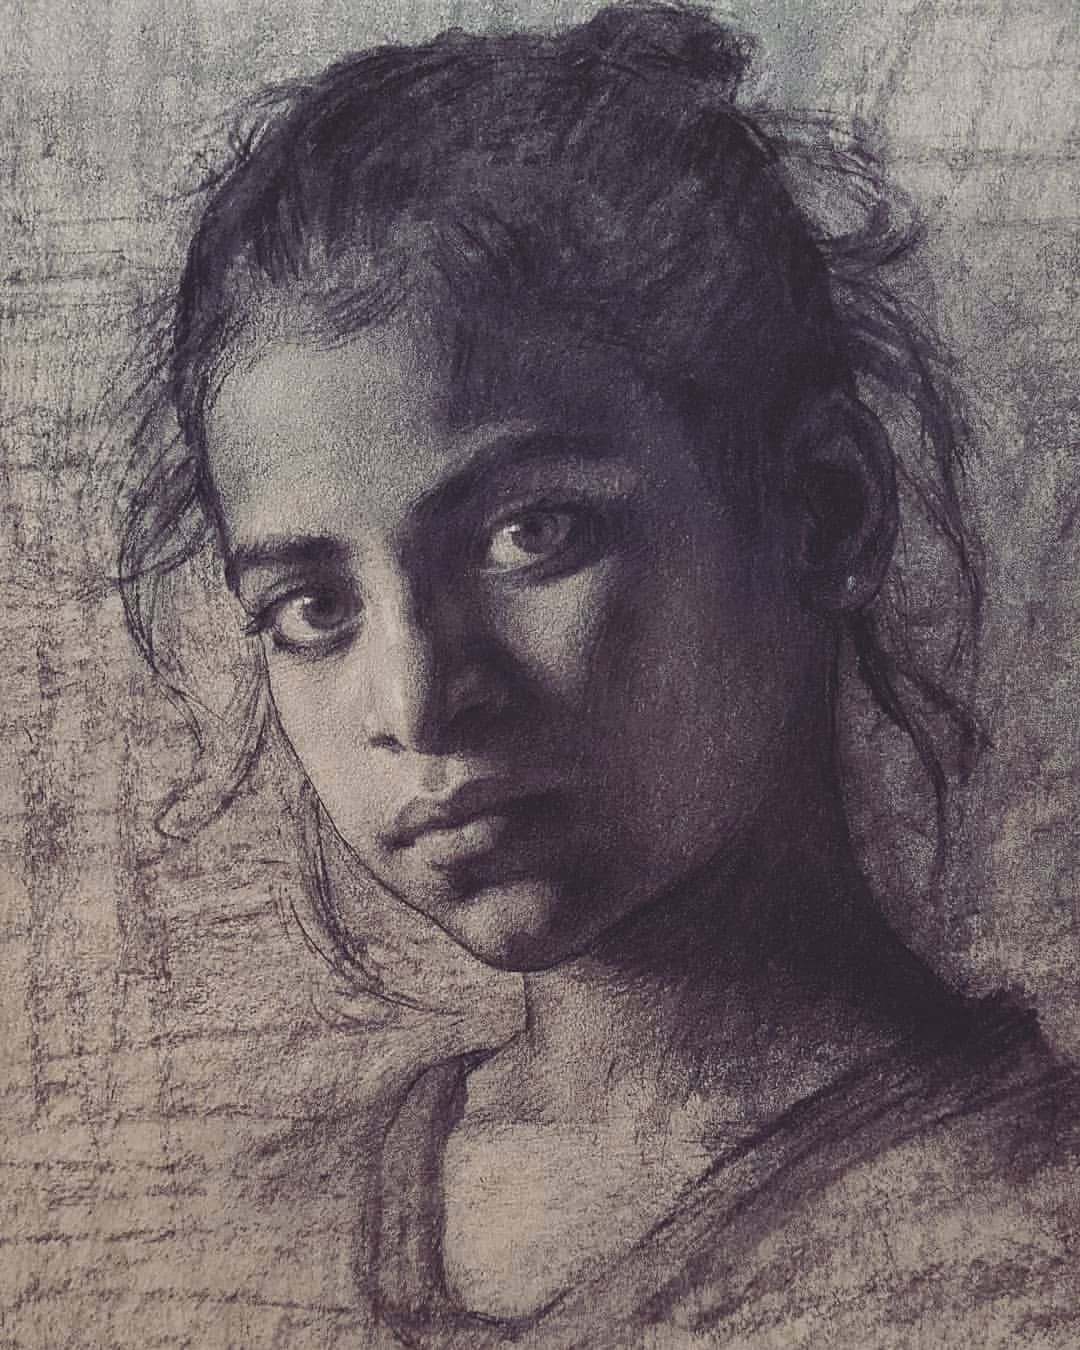 Original Art Approach Original Portrait Pencil Drawing Portrait Sketch Figurative Art Realism